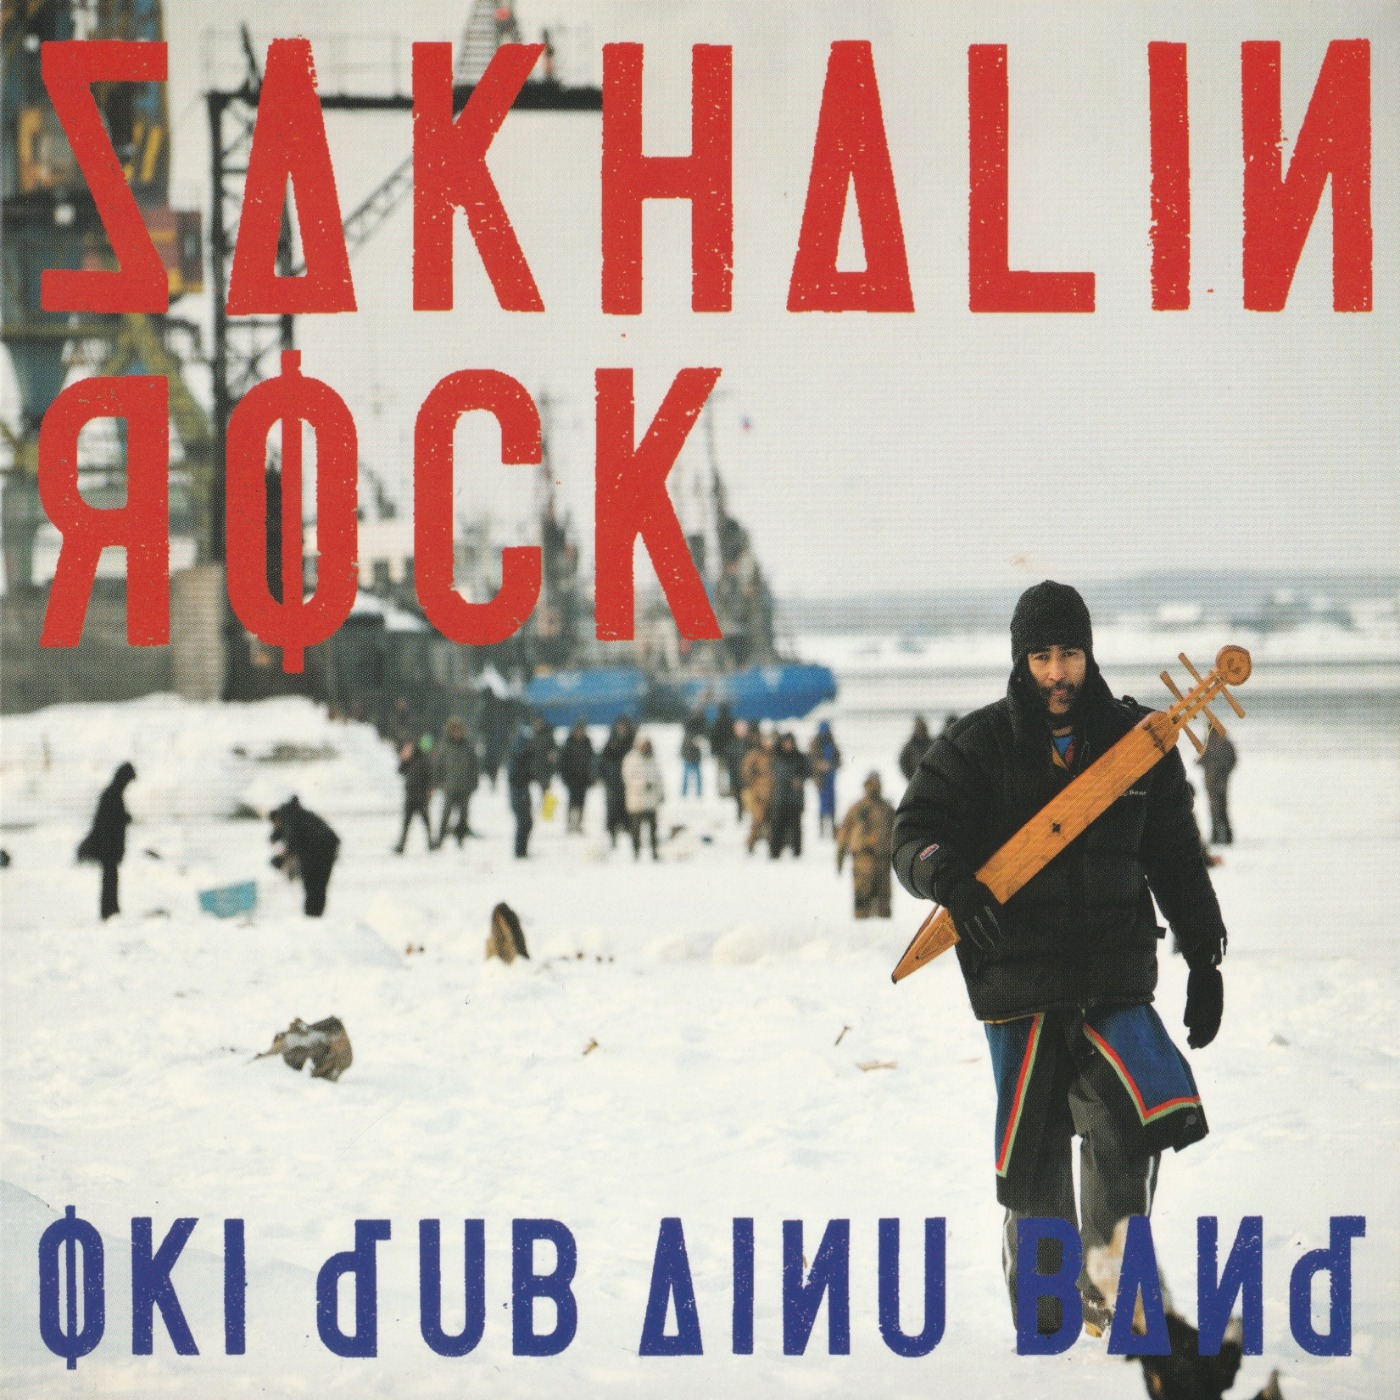 SAKHALIN ROCK / OKI DUB AINU BAND